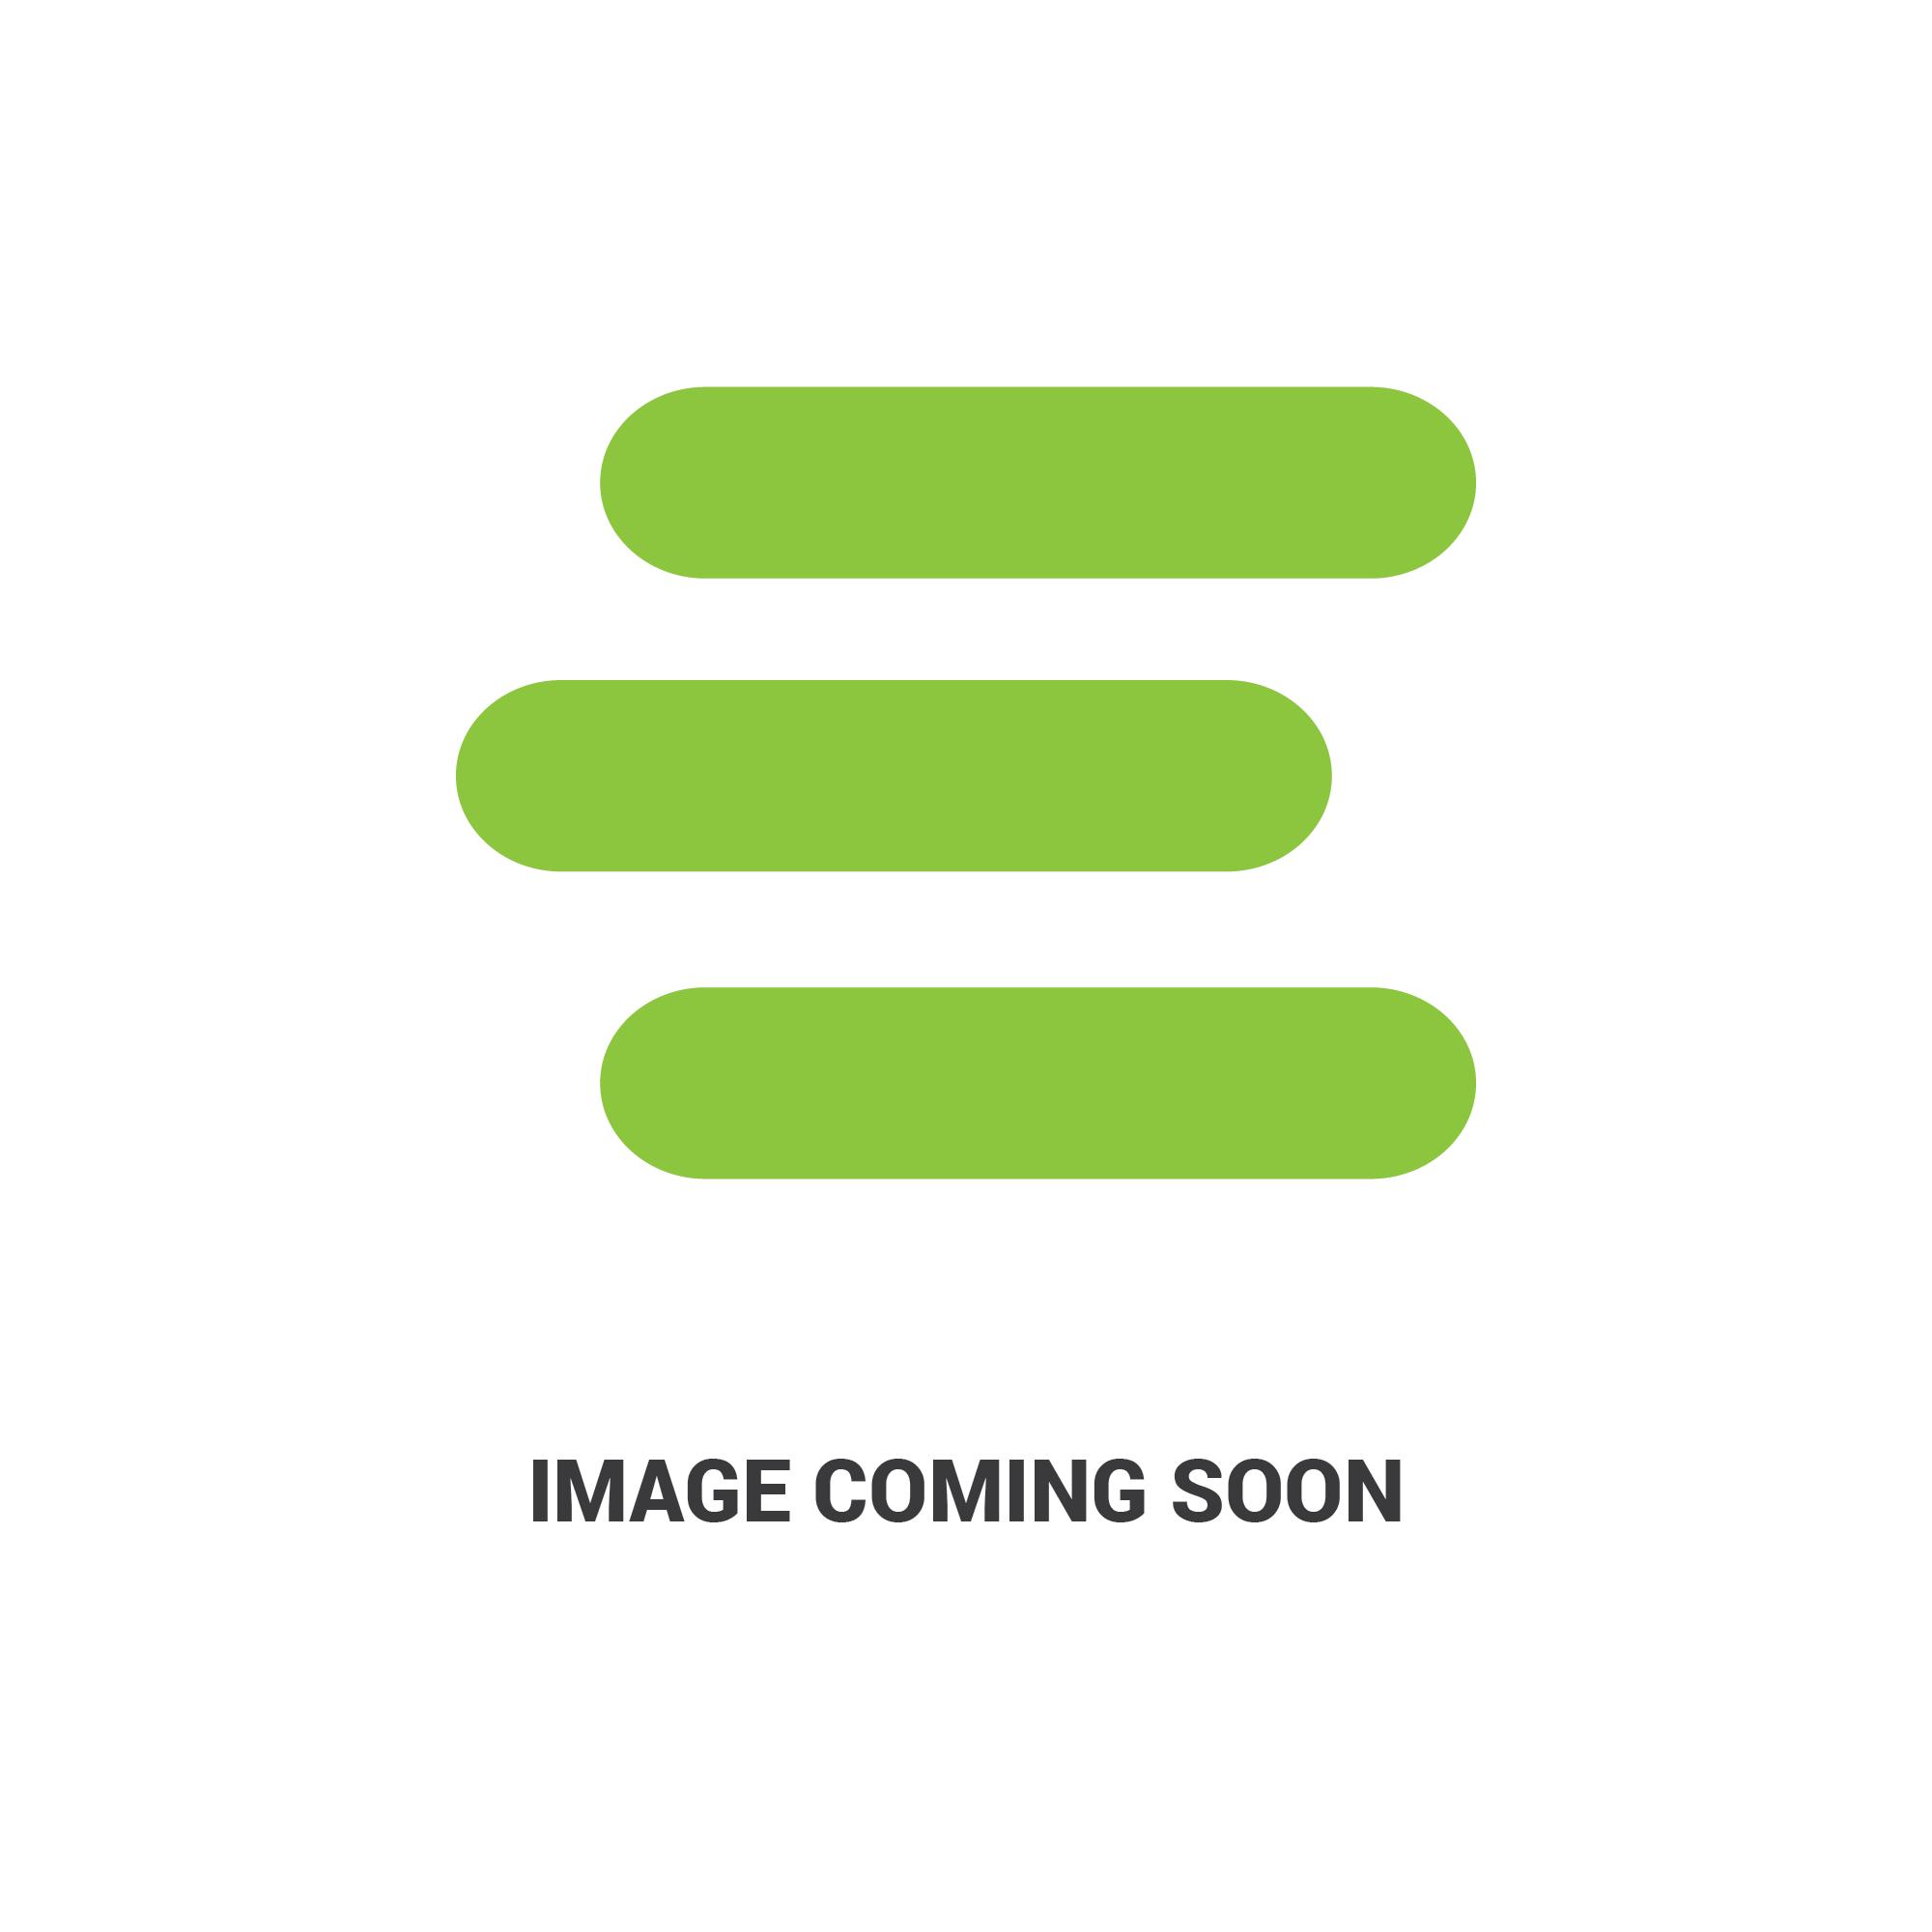 E-6736379edit 1.jpg